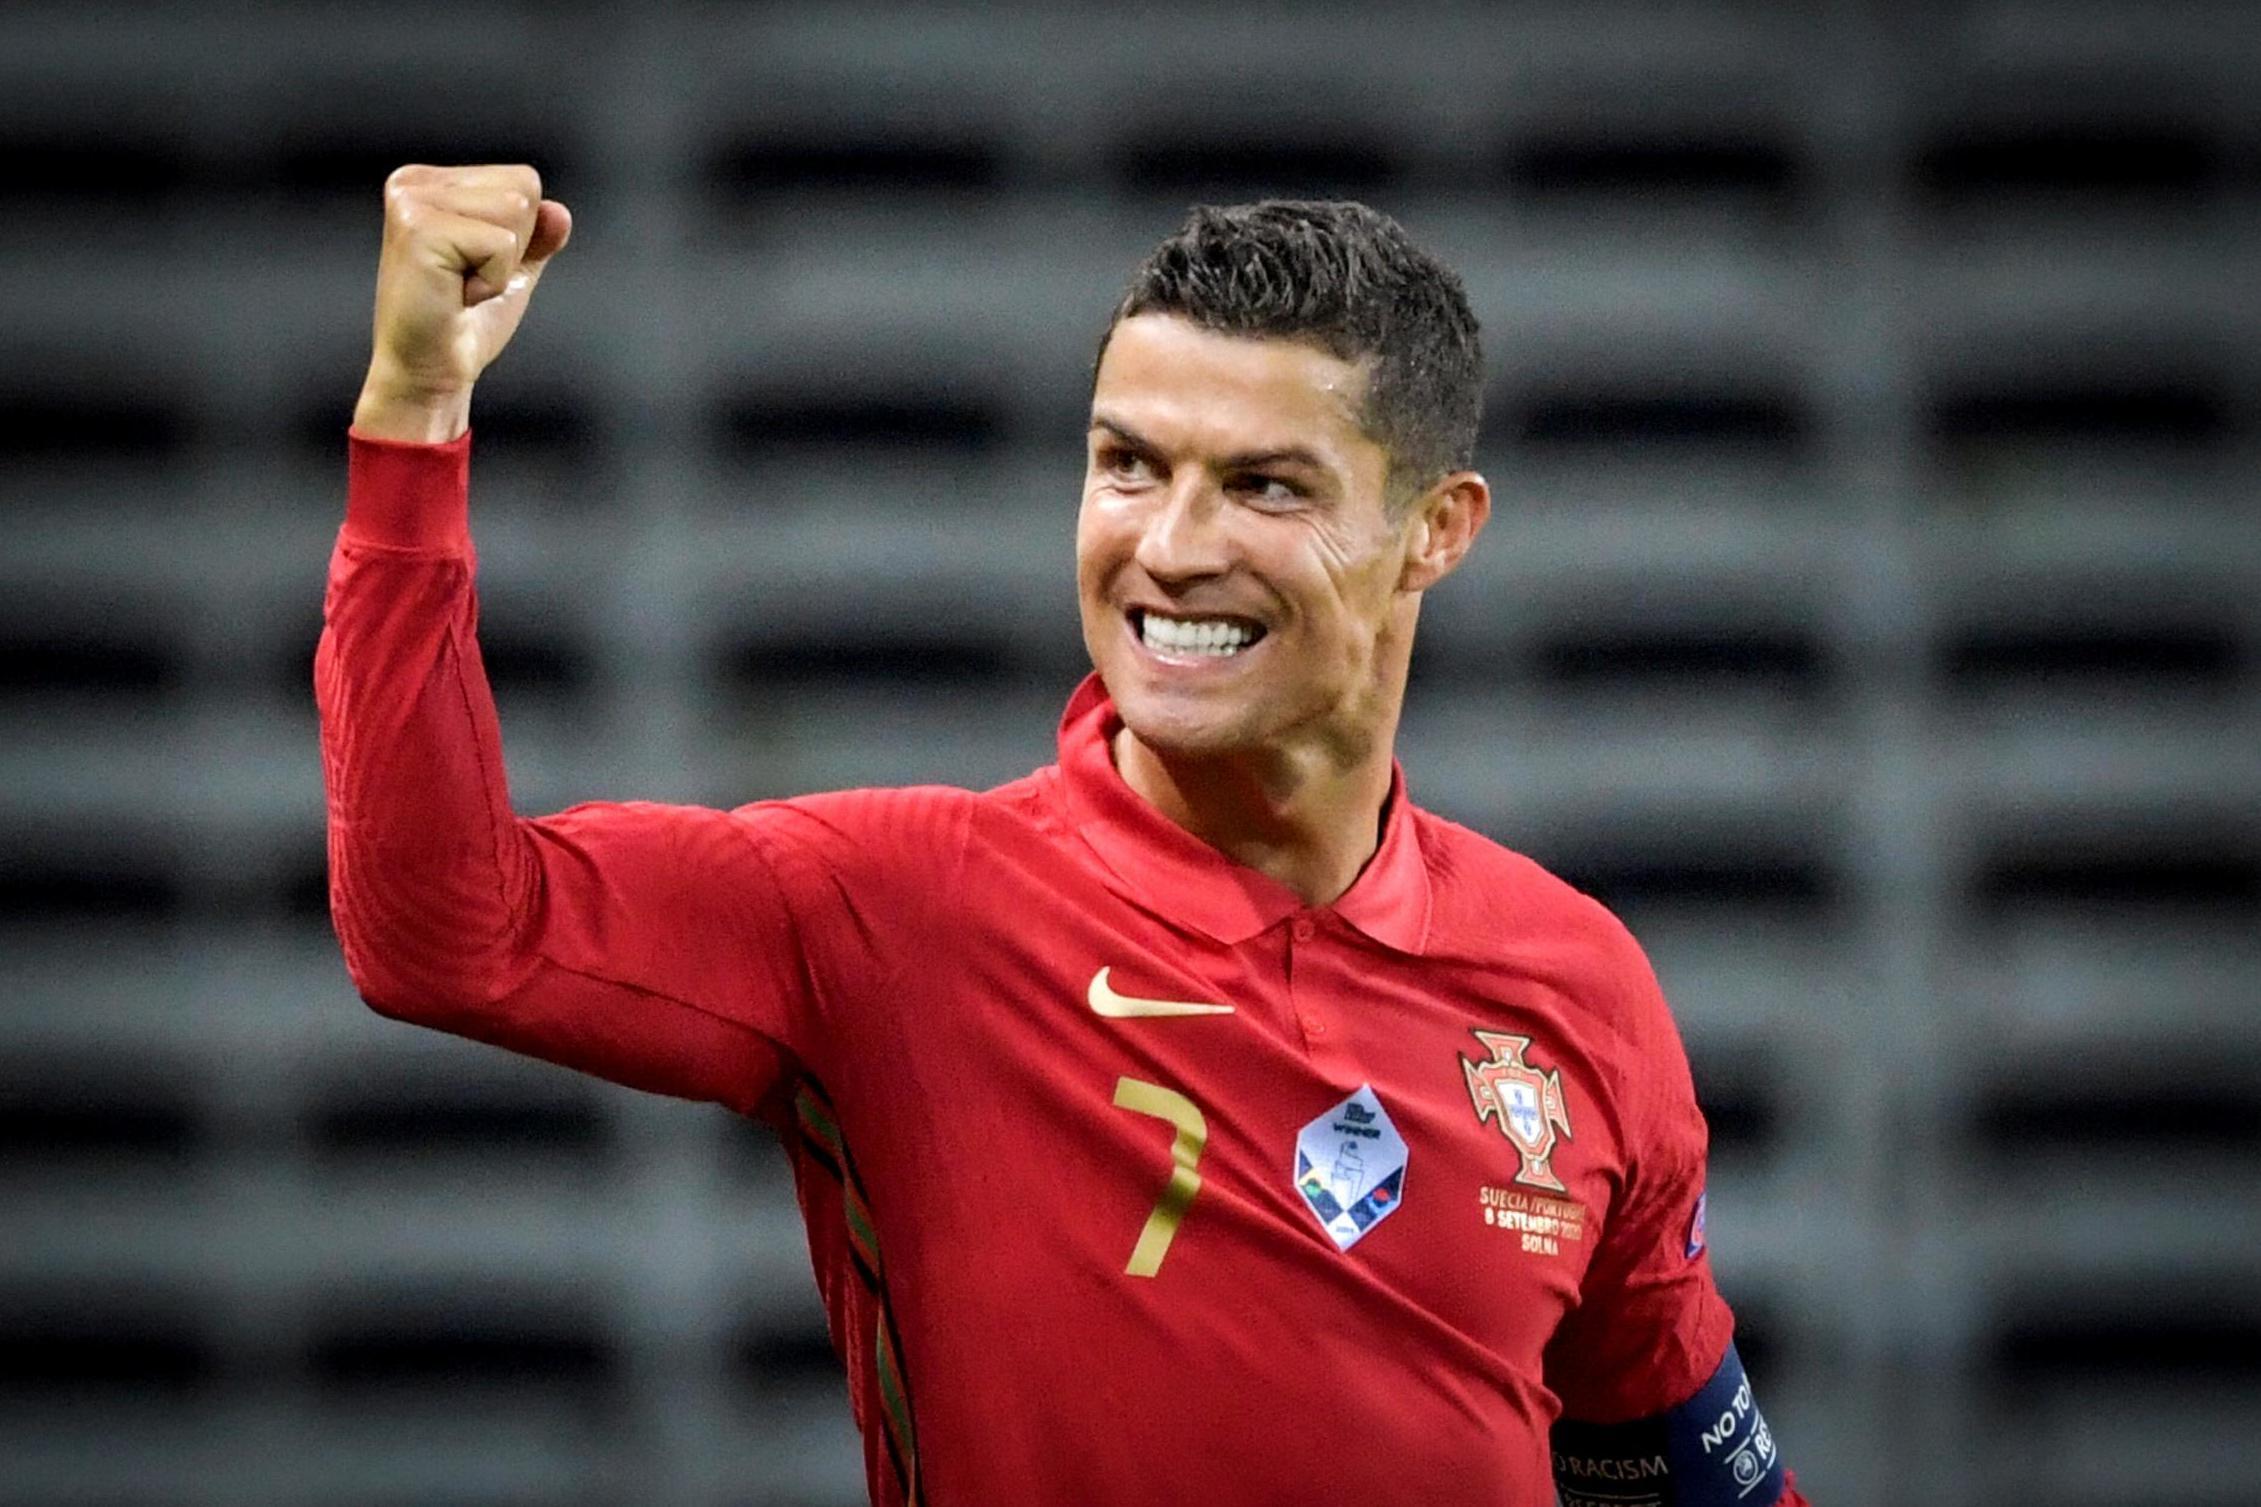 Cristiano Ronaldo has tested positive for COVID19 - The Shillong Times